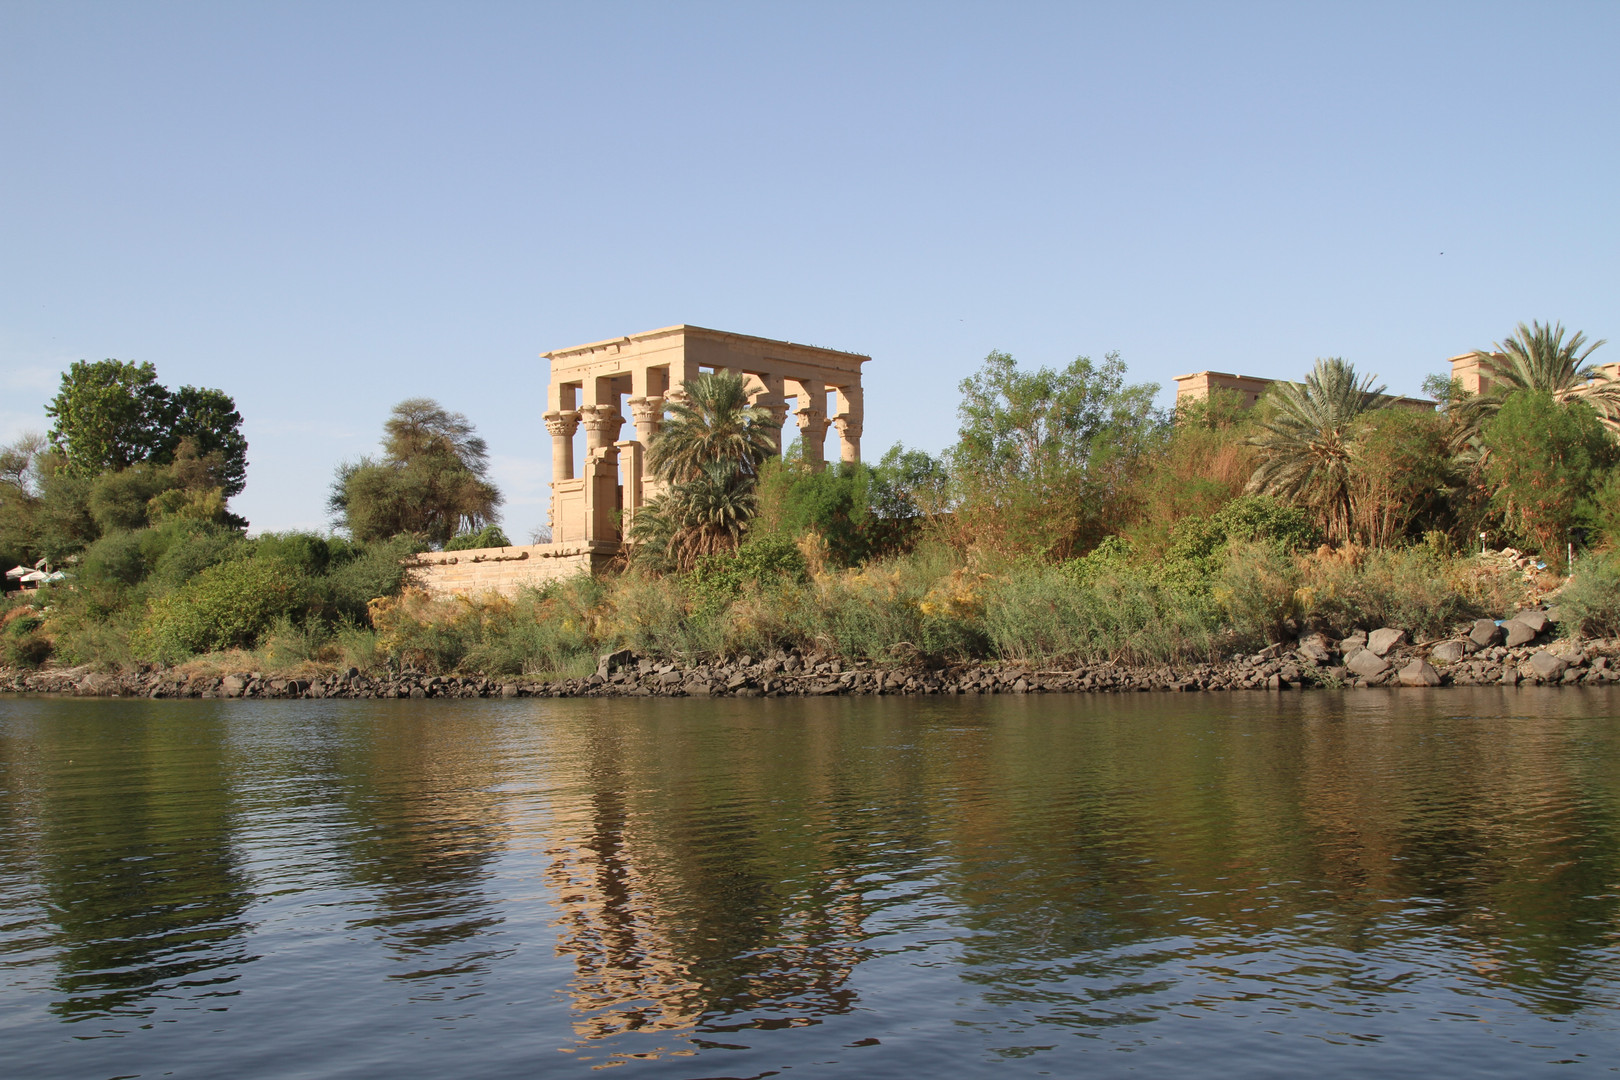 Nile_Ep4_004.jpg